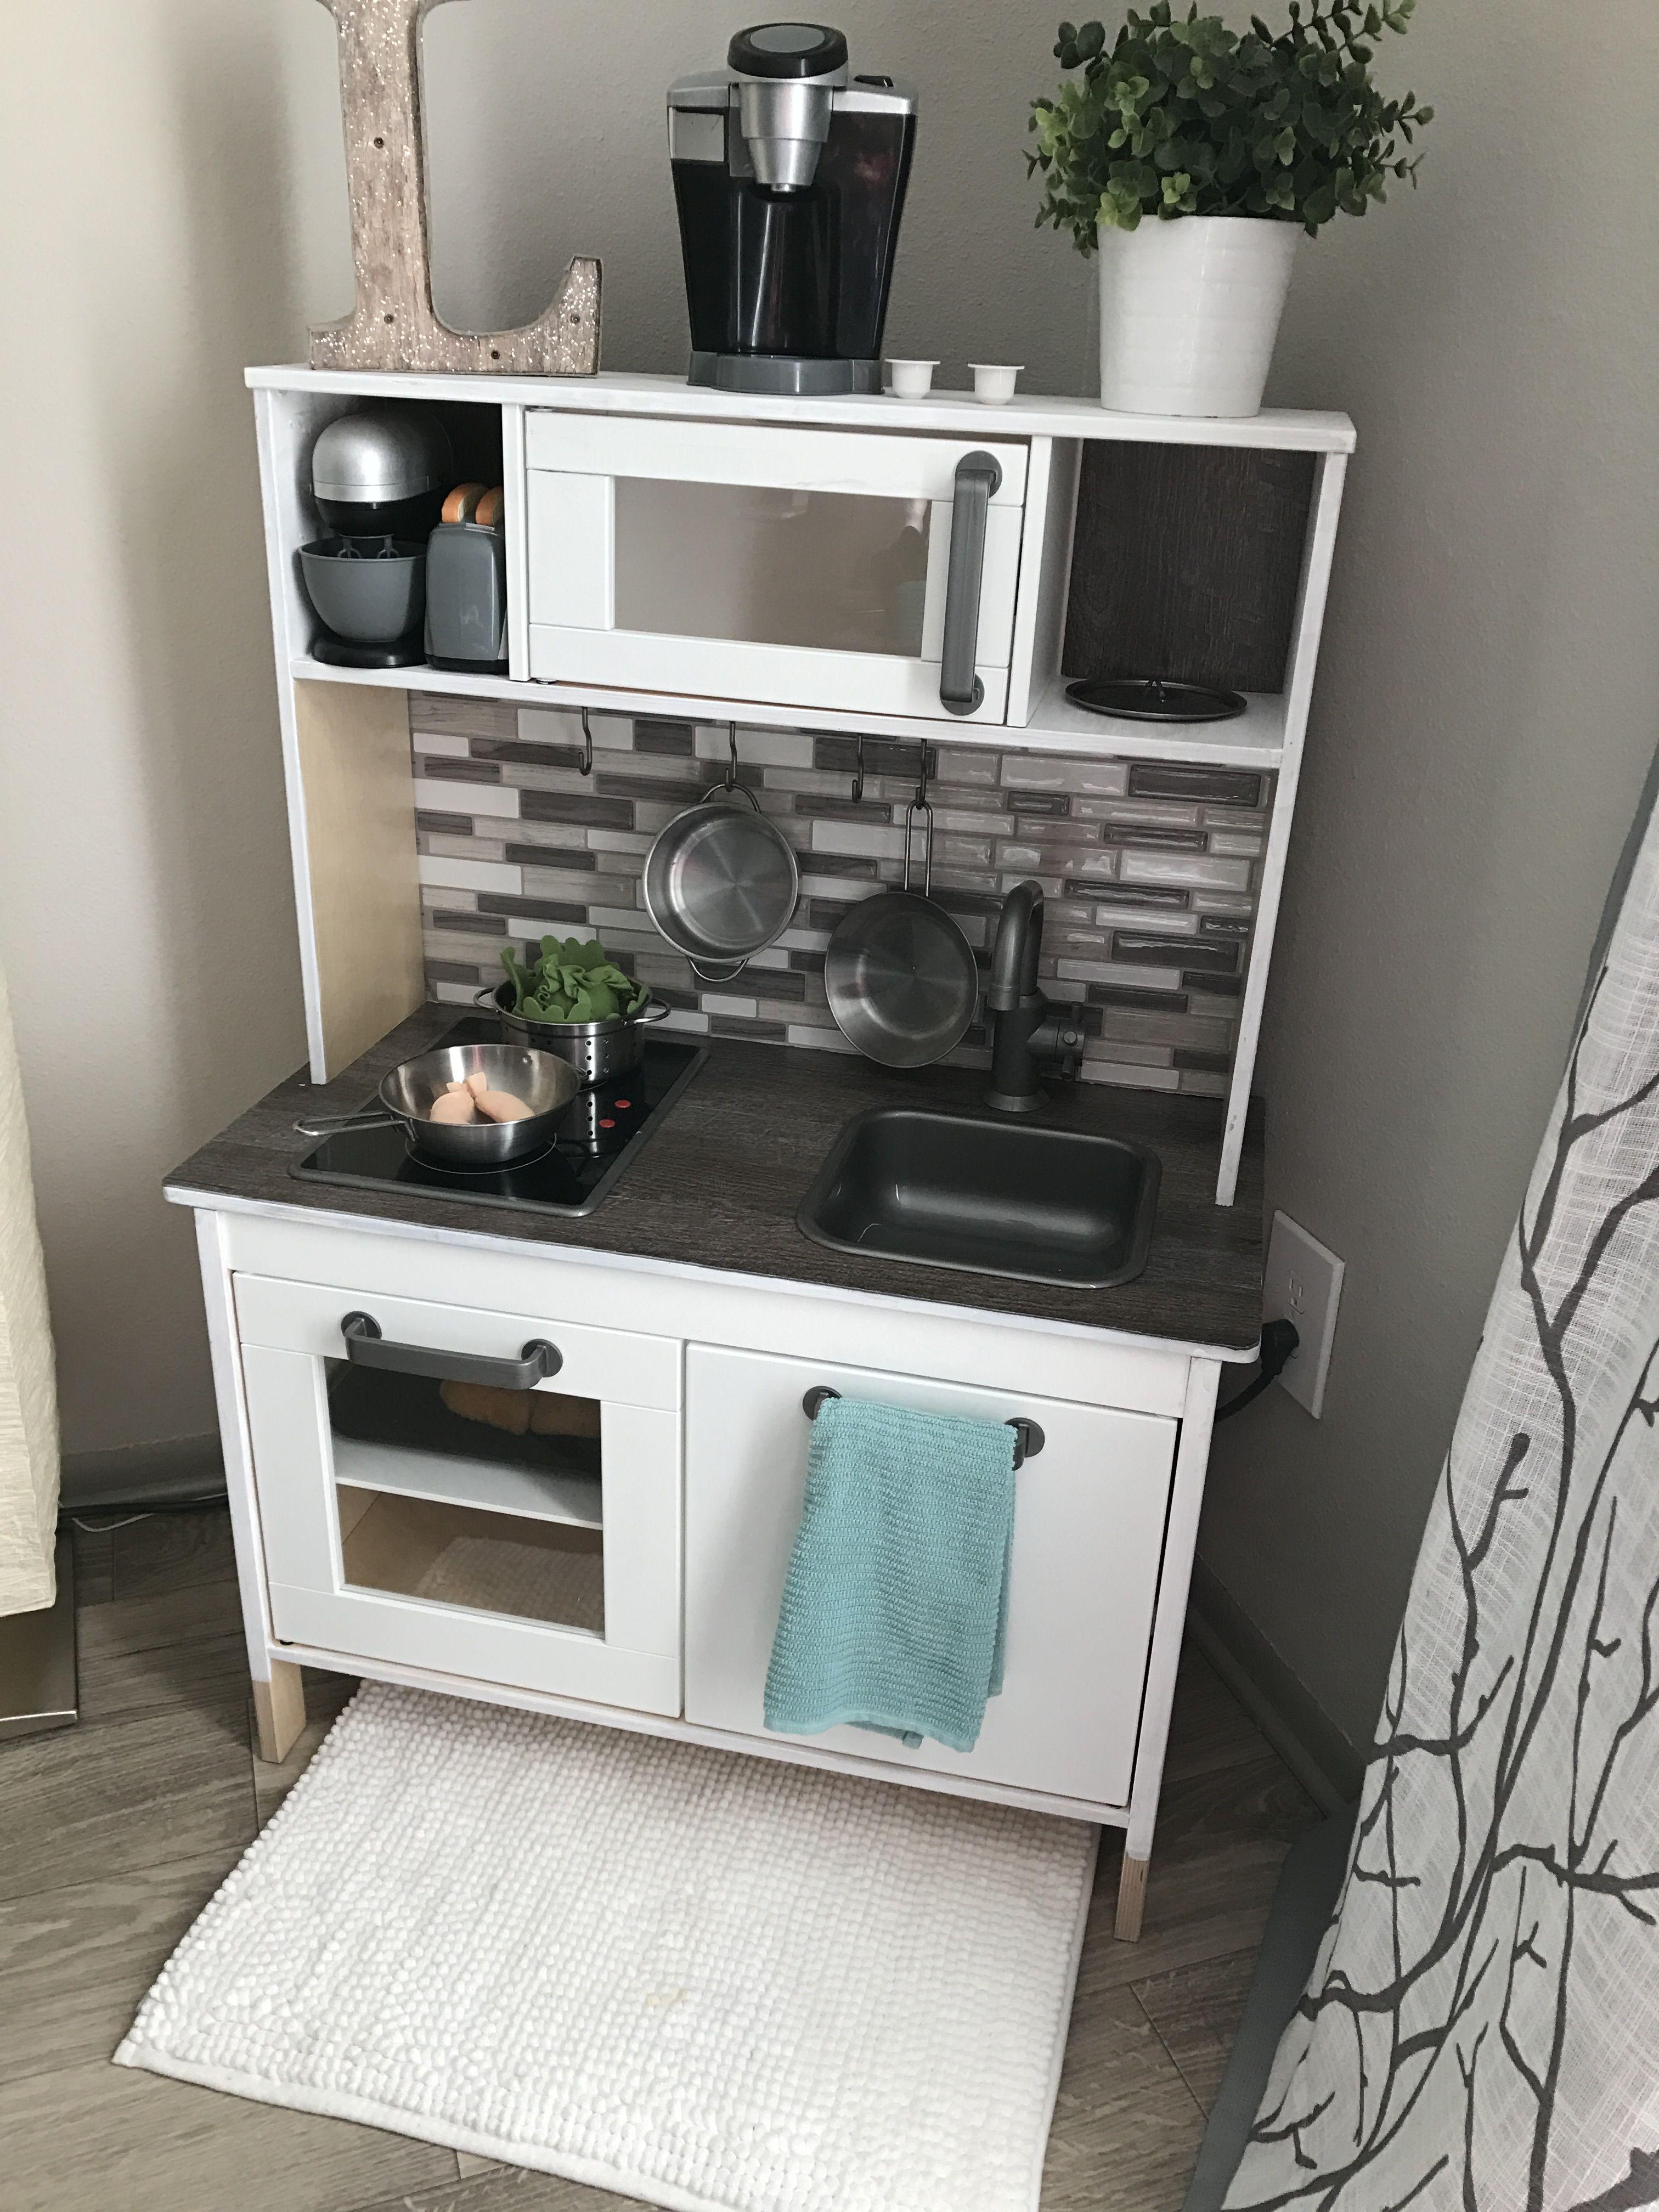 Merveilleux DIY Renovation IKEA Kids Kitchen